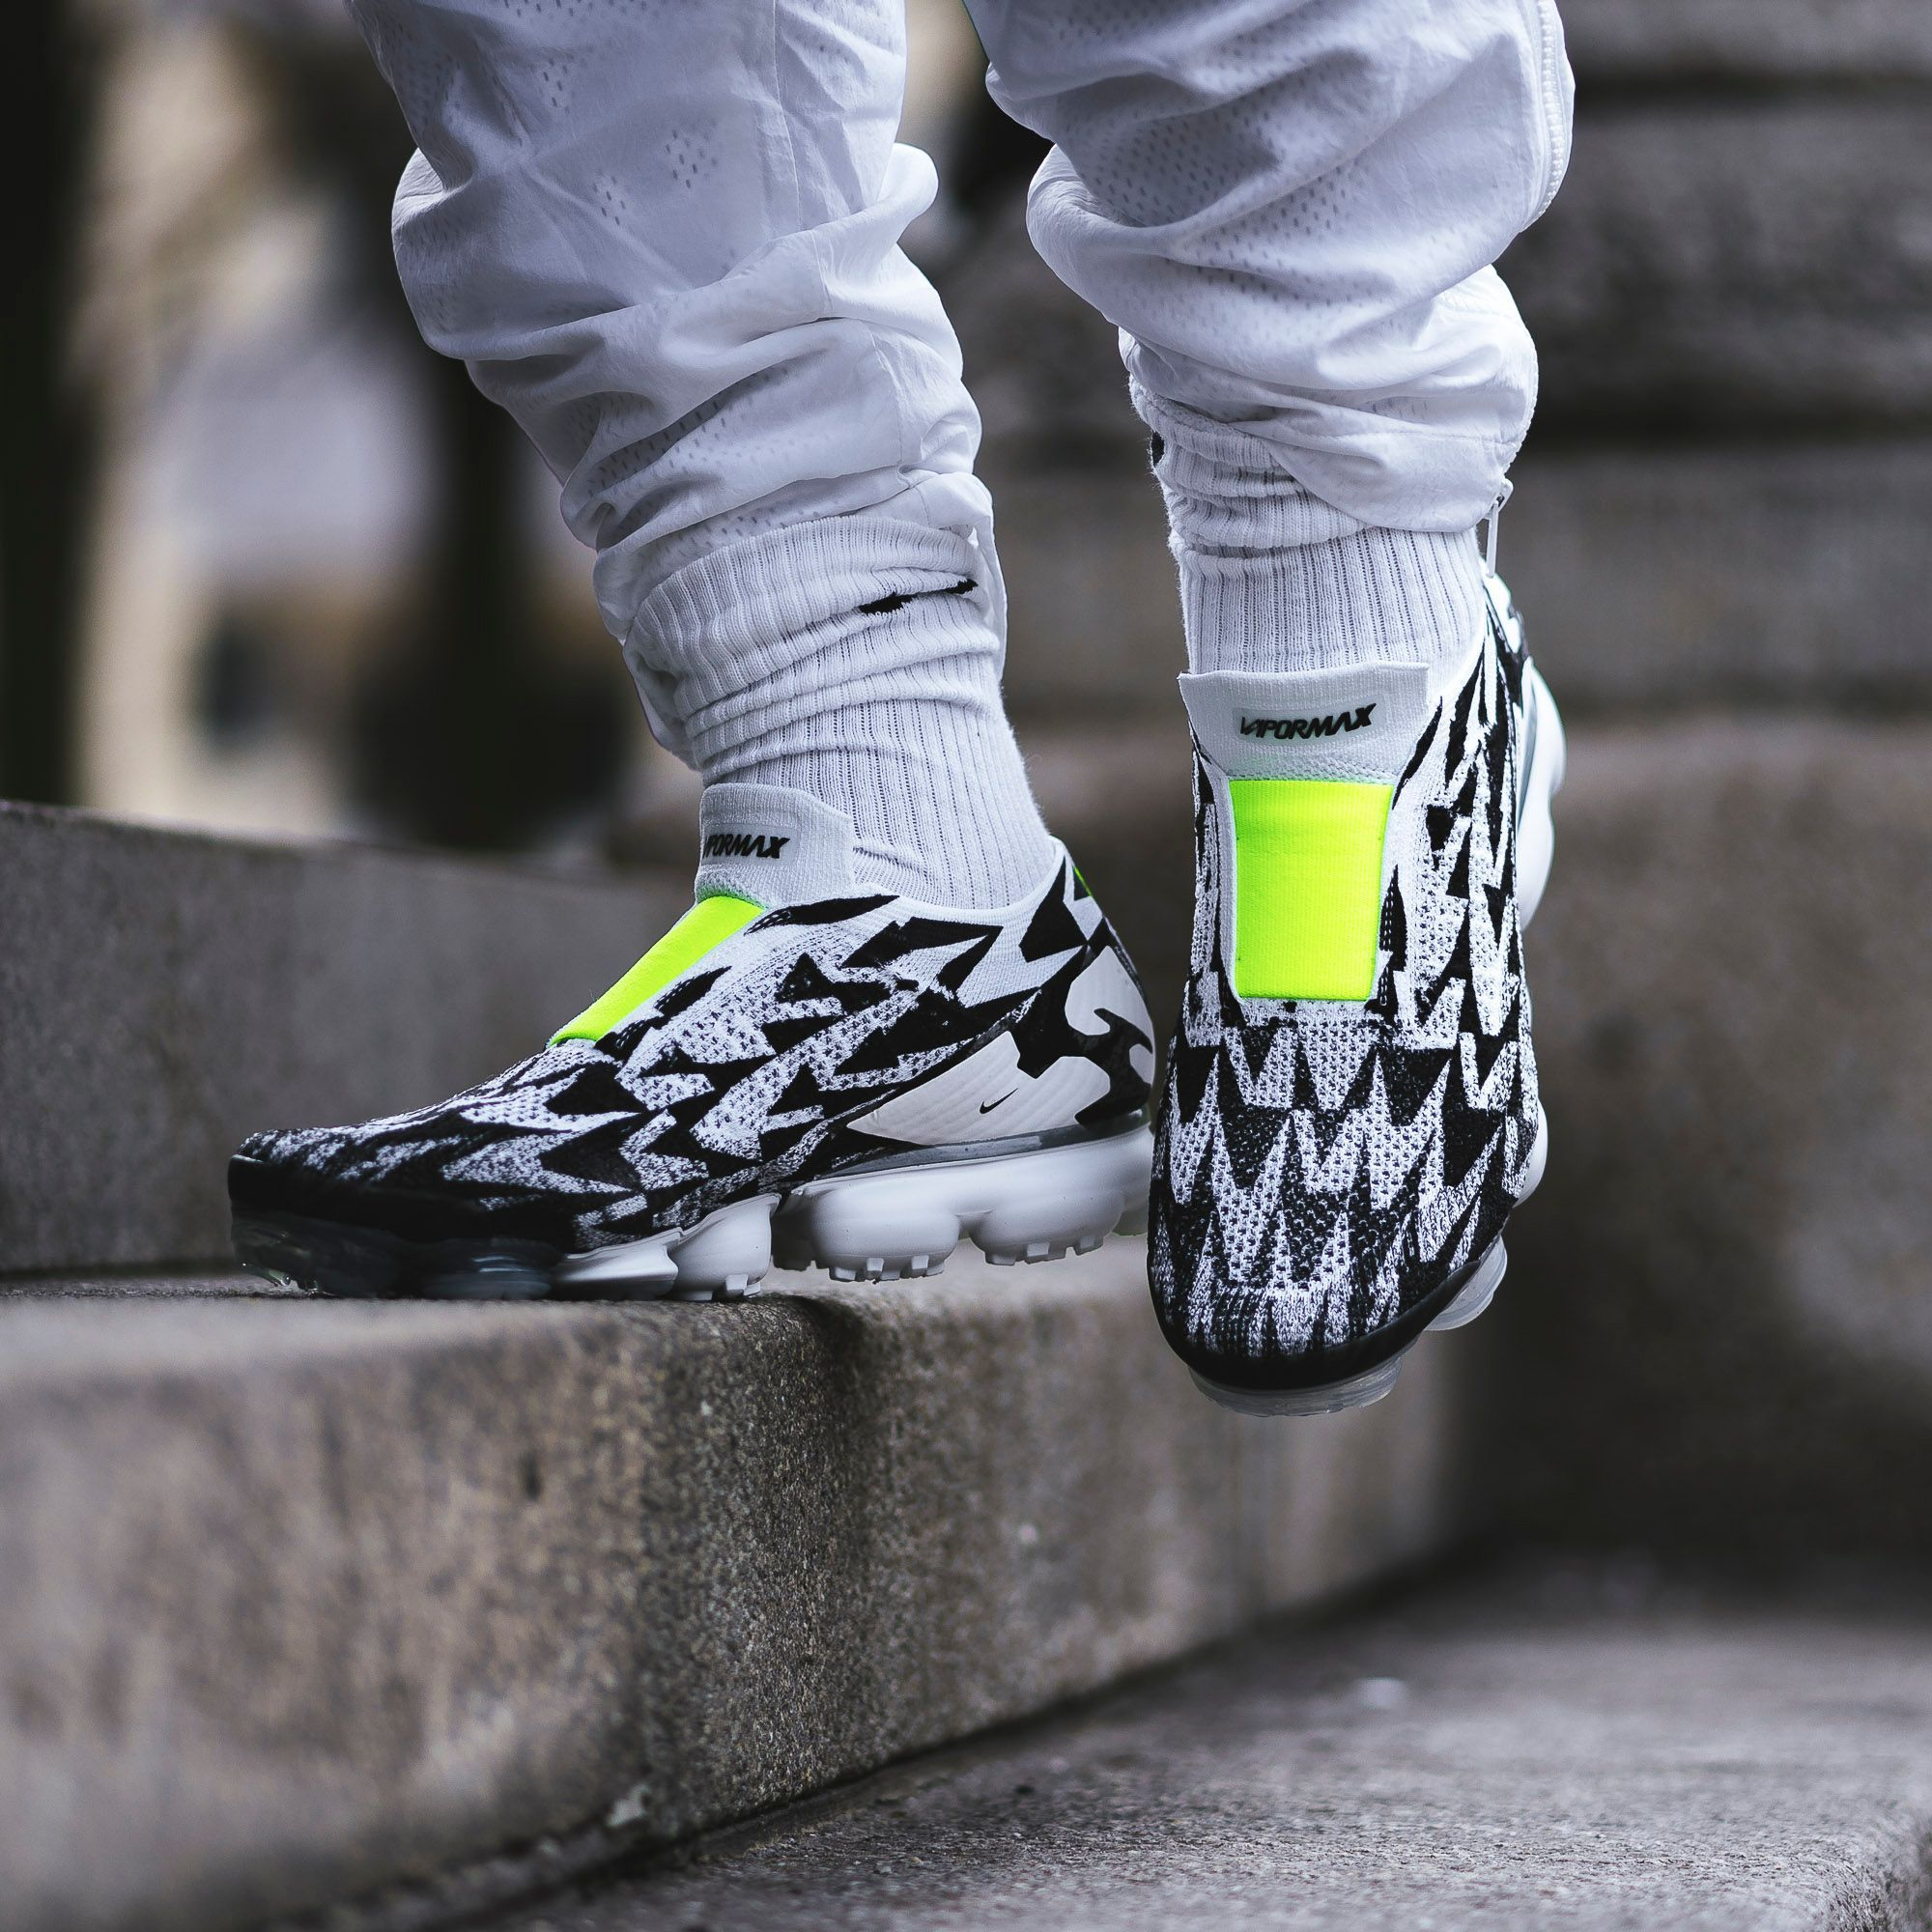 separation shoes c060e 95296 ACRONYM x Nike Air VaporMax Moc 2 Black White  AQ0996-001  The Sole  Supplier